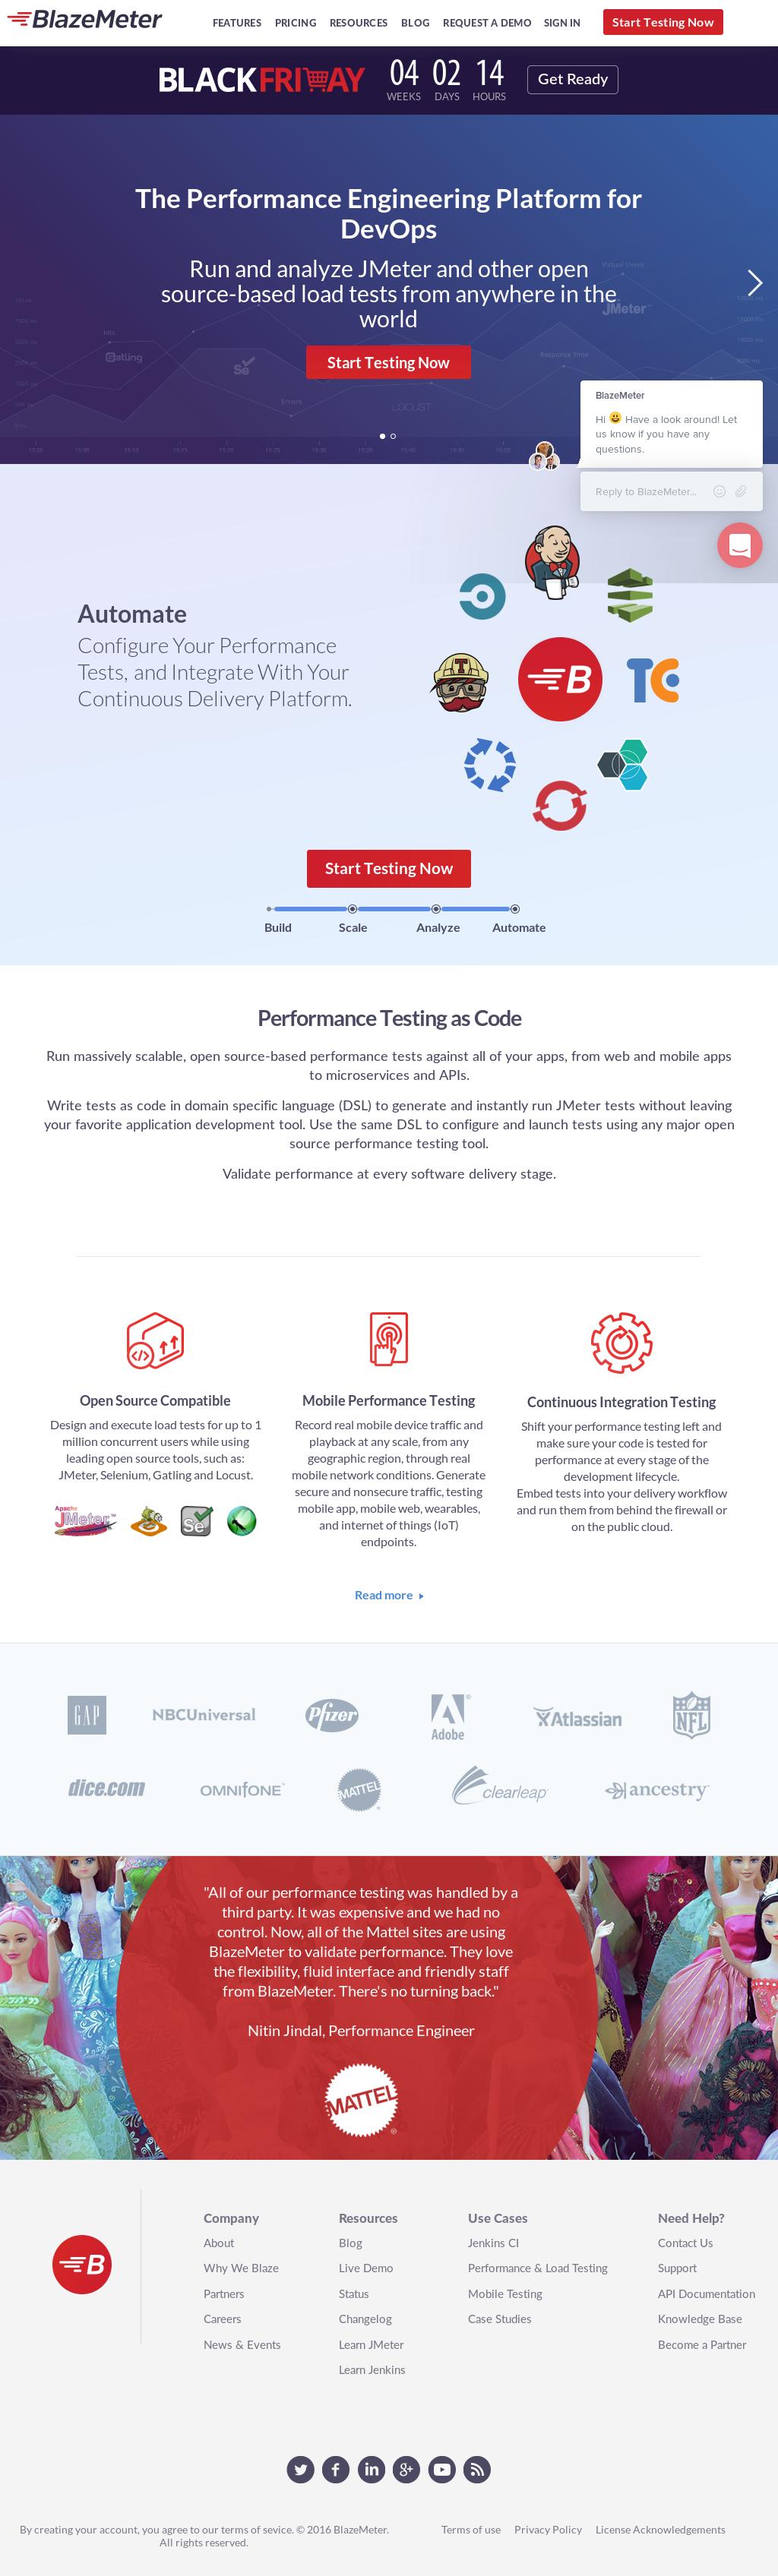 Owler Reports - BlazeMeter Blog Rest API testing with Spring